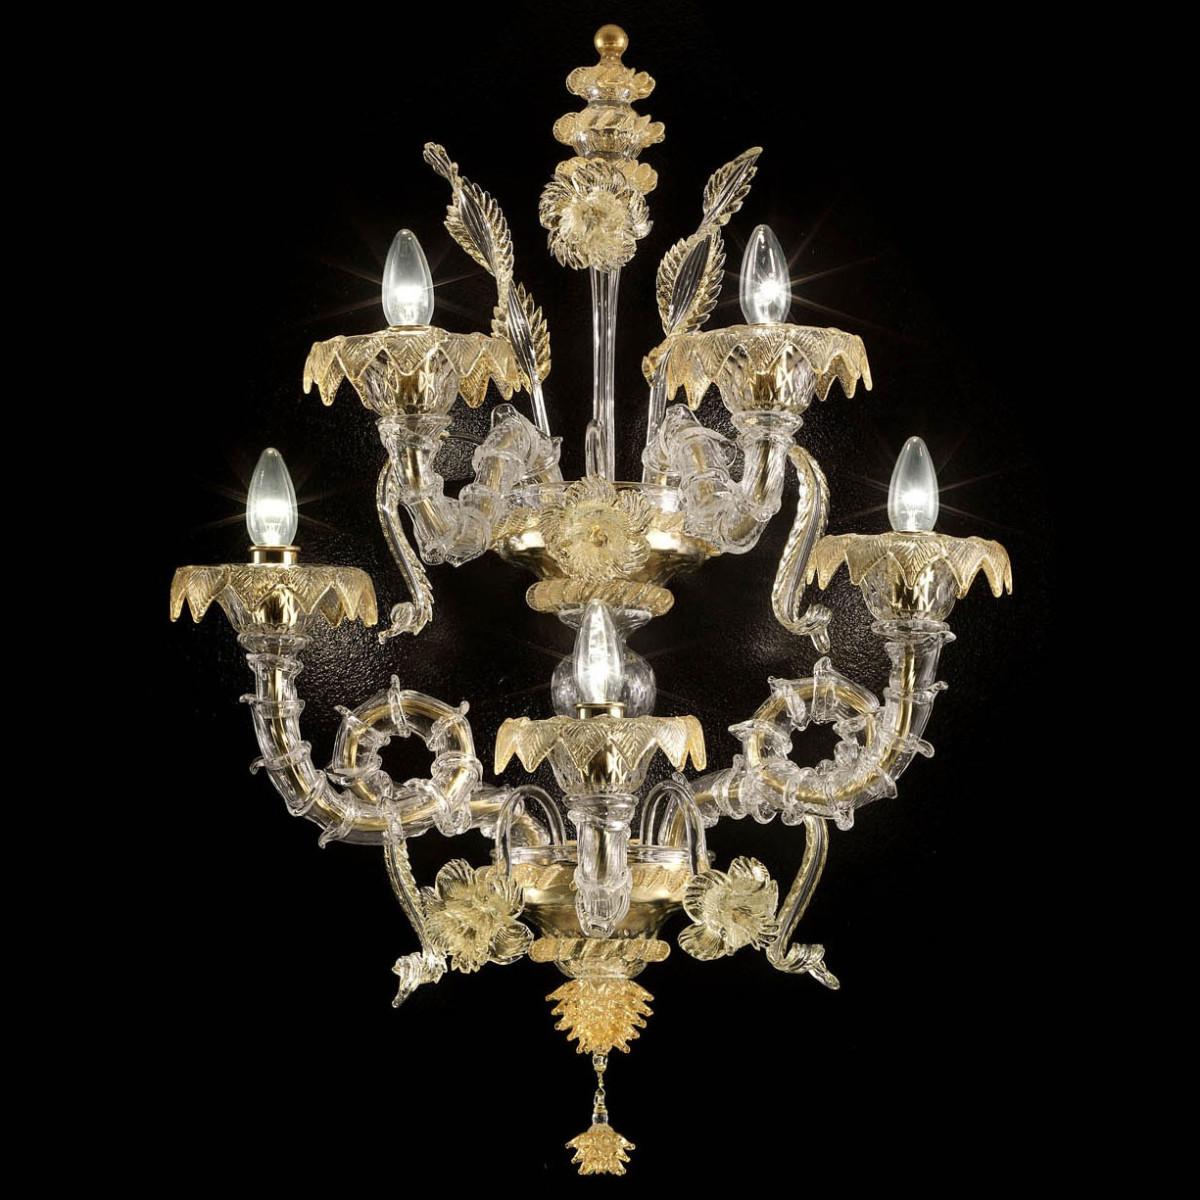 """San Zaccaria"" Murano glas wandleuchte - 5 flammig - transparent und gold"